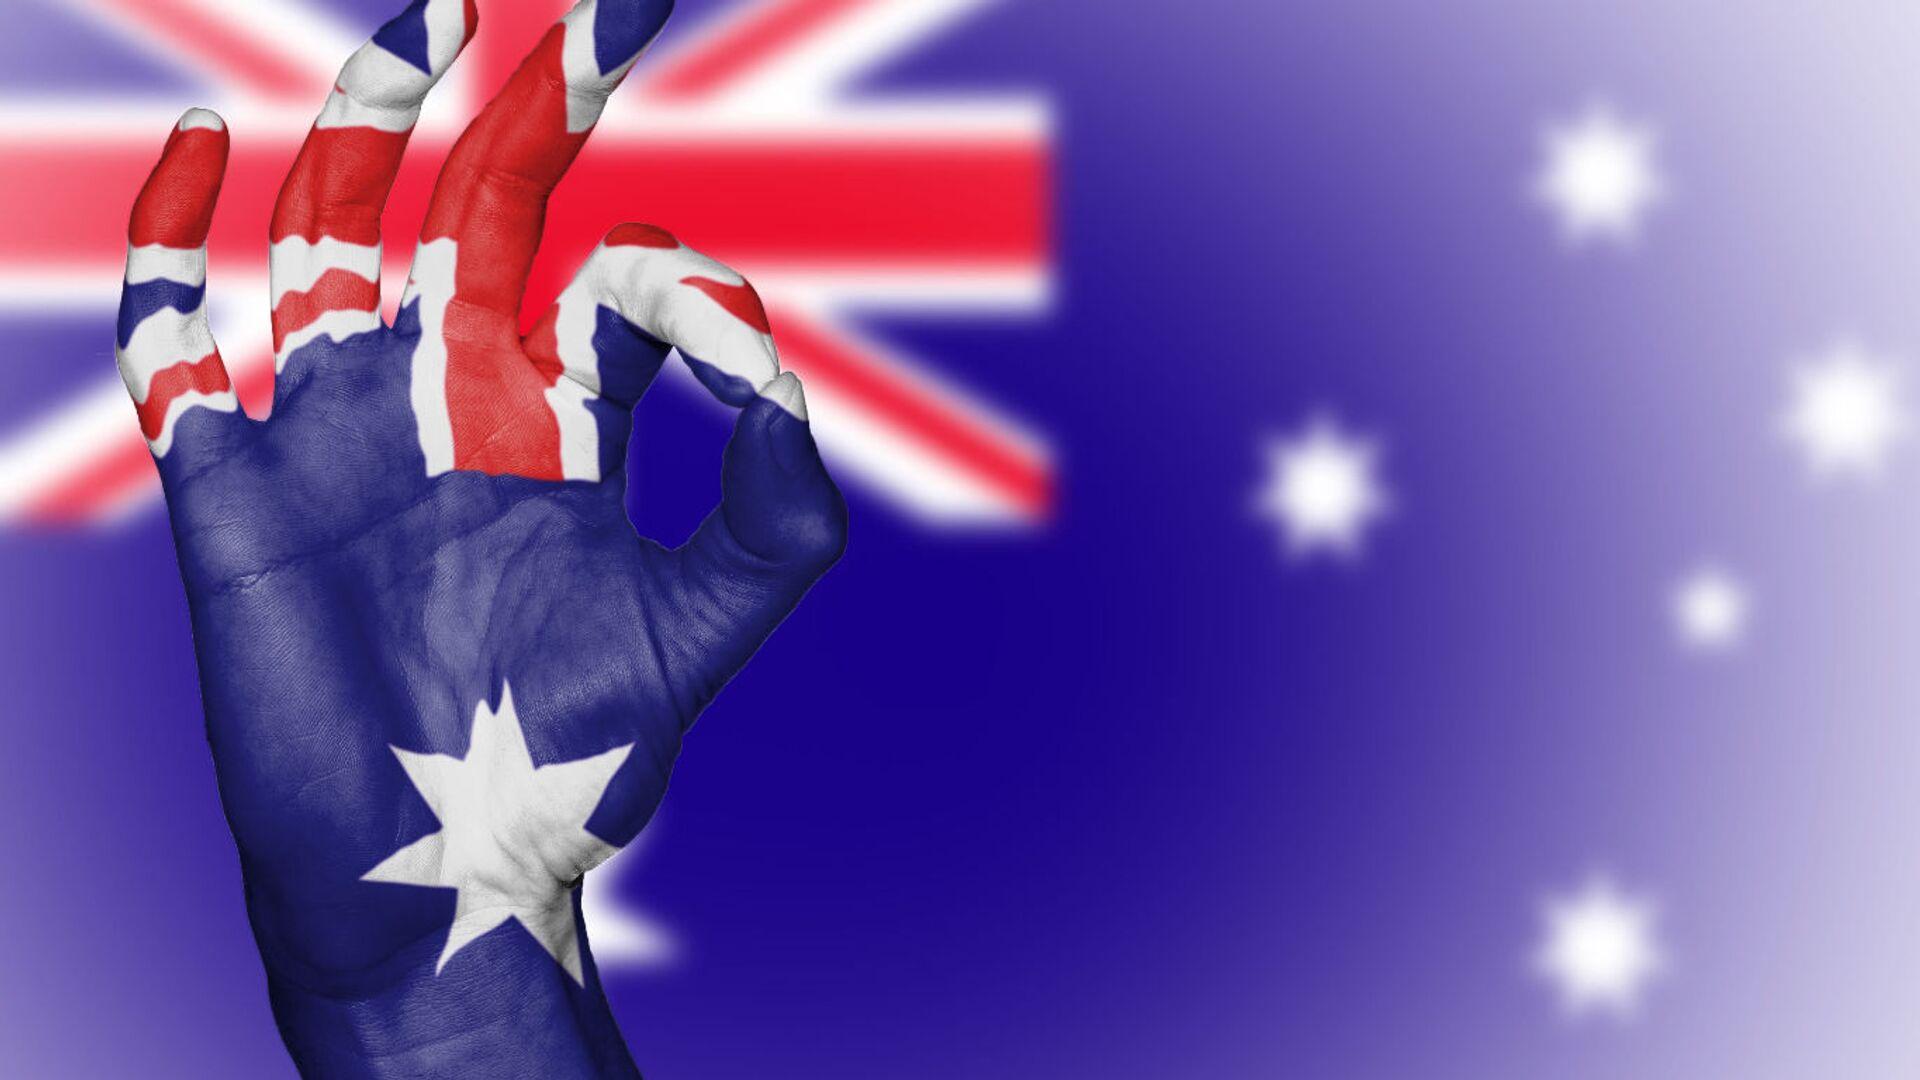 Flag of Australia - Sputnik International, 1920, 17.09.2021